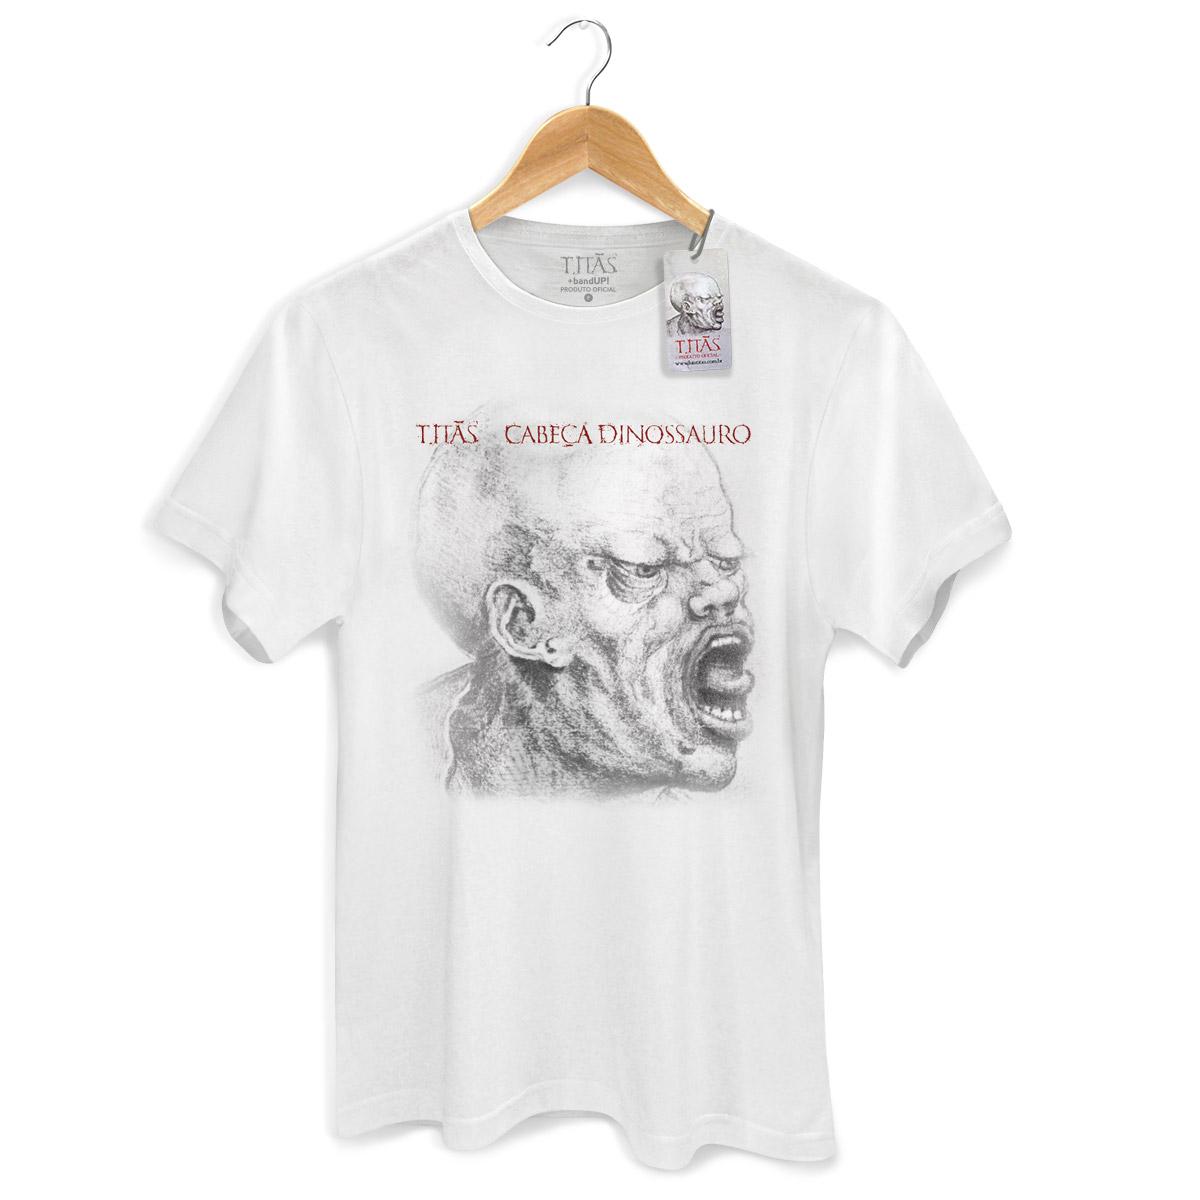 Camiseta Masculina Titãs Cabeça Dinossauro  - bandUP Store Marketplace